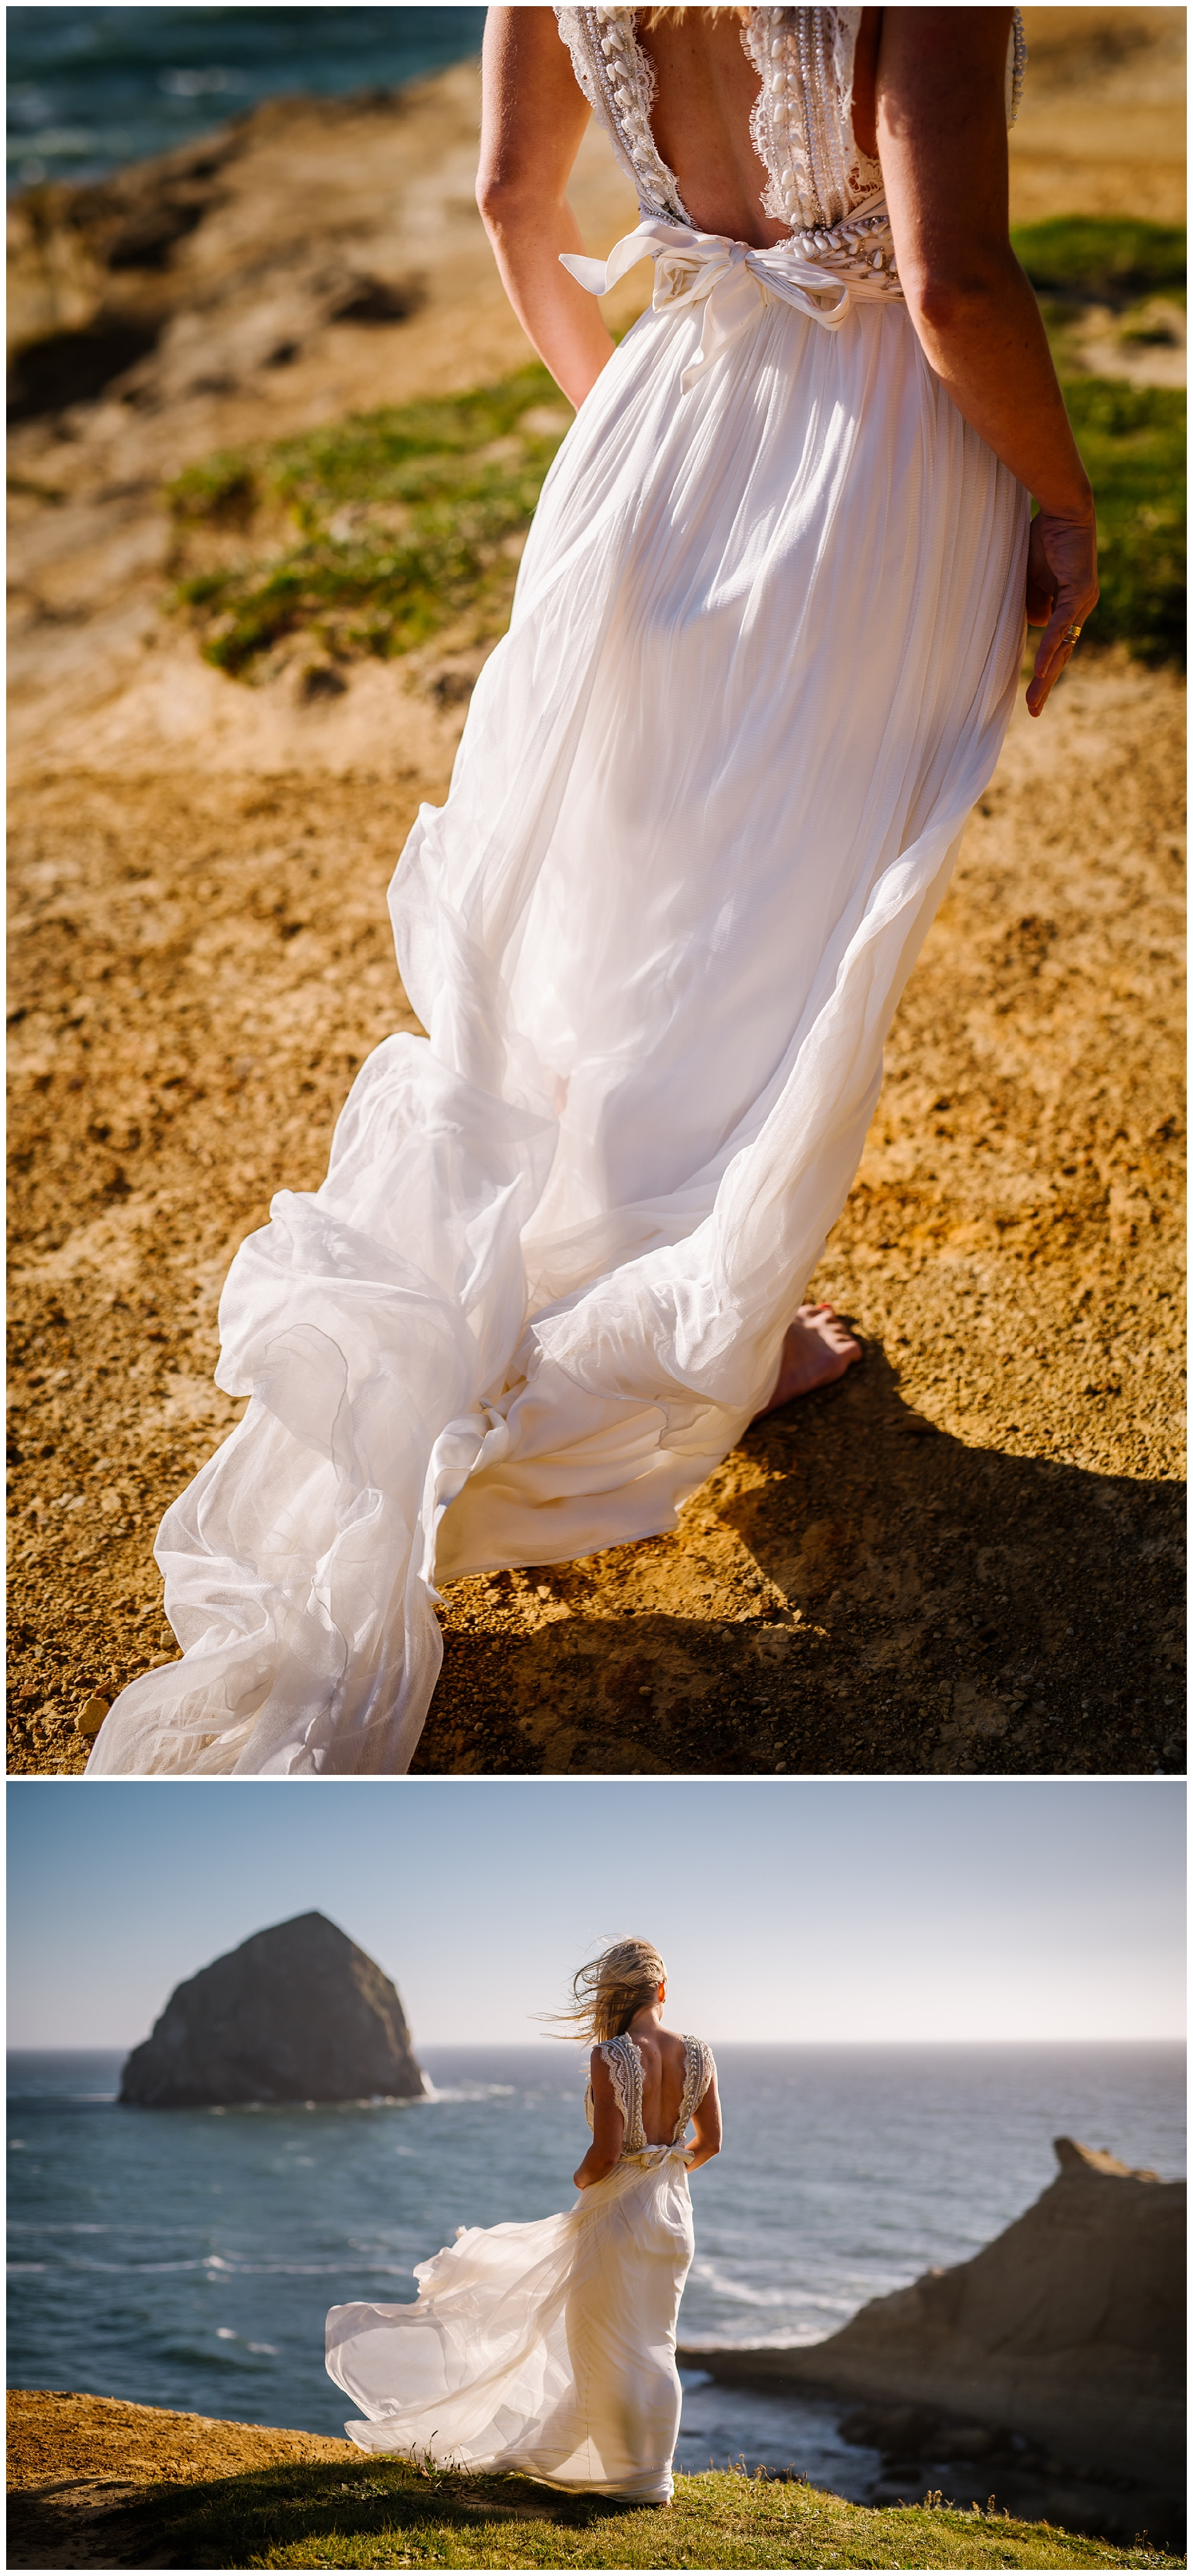 Cape-kiwanda-bridal-portrait-destination-wedding-photographer_0016.jpg